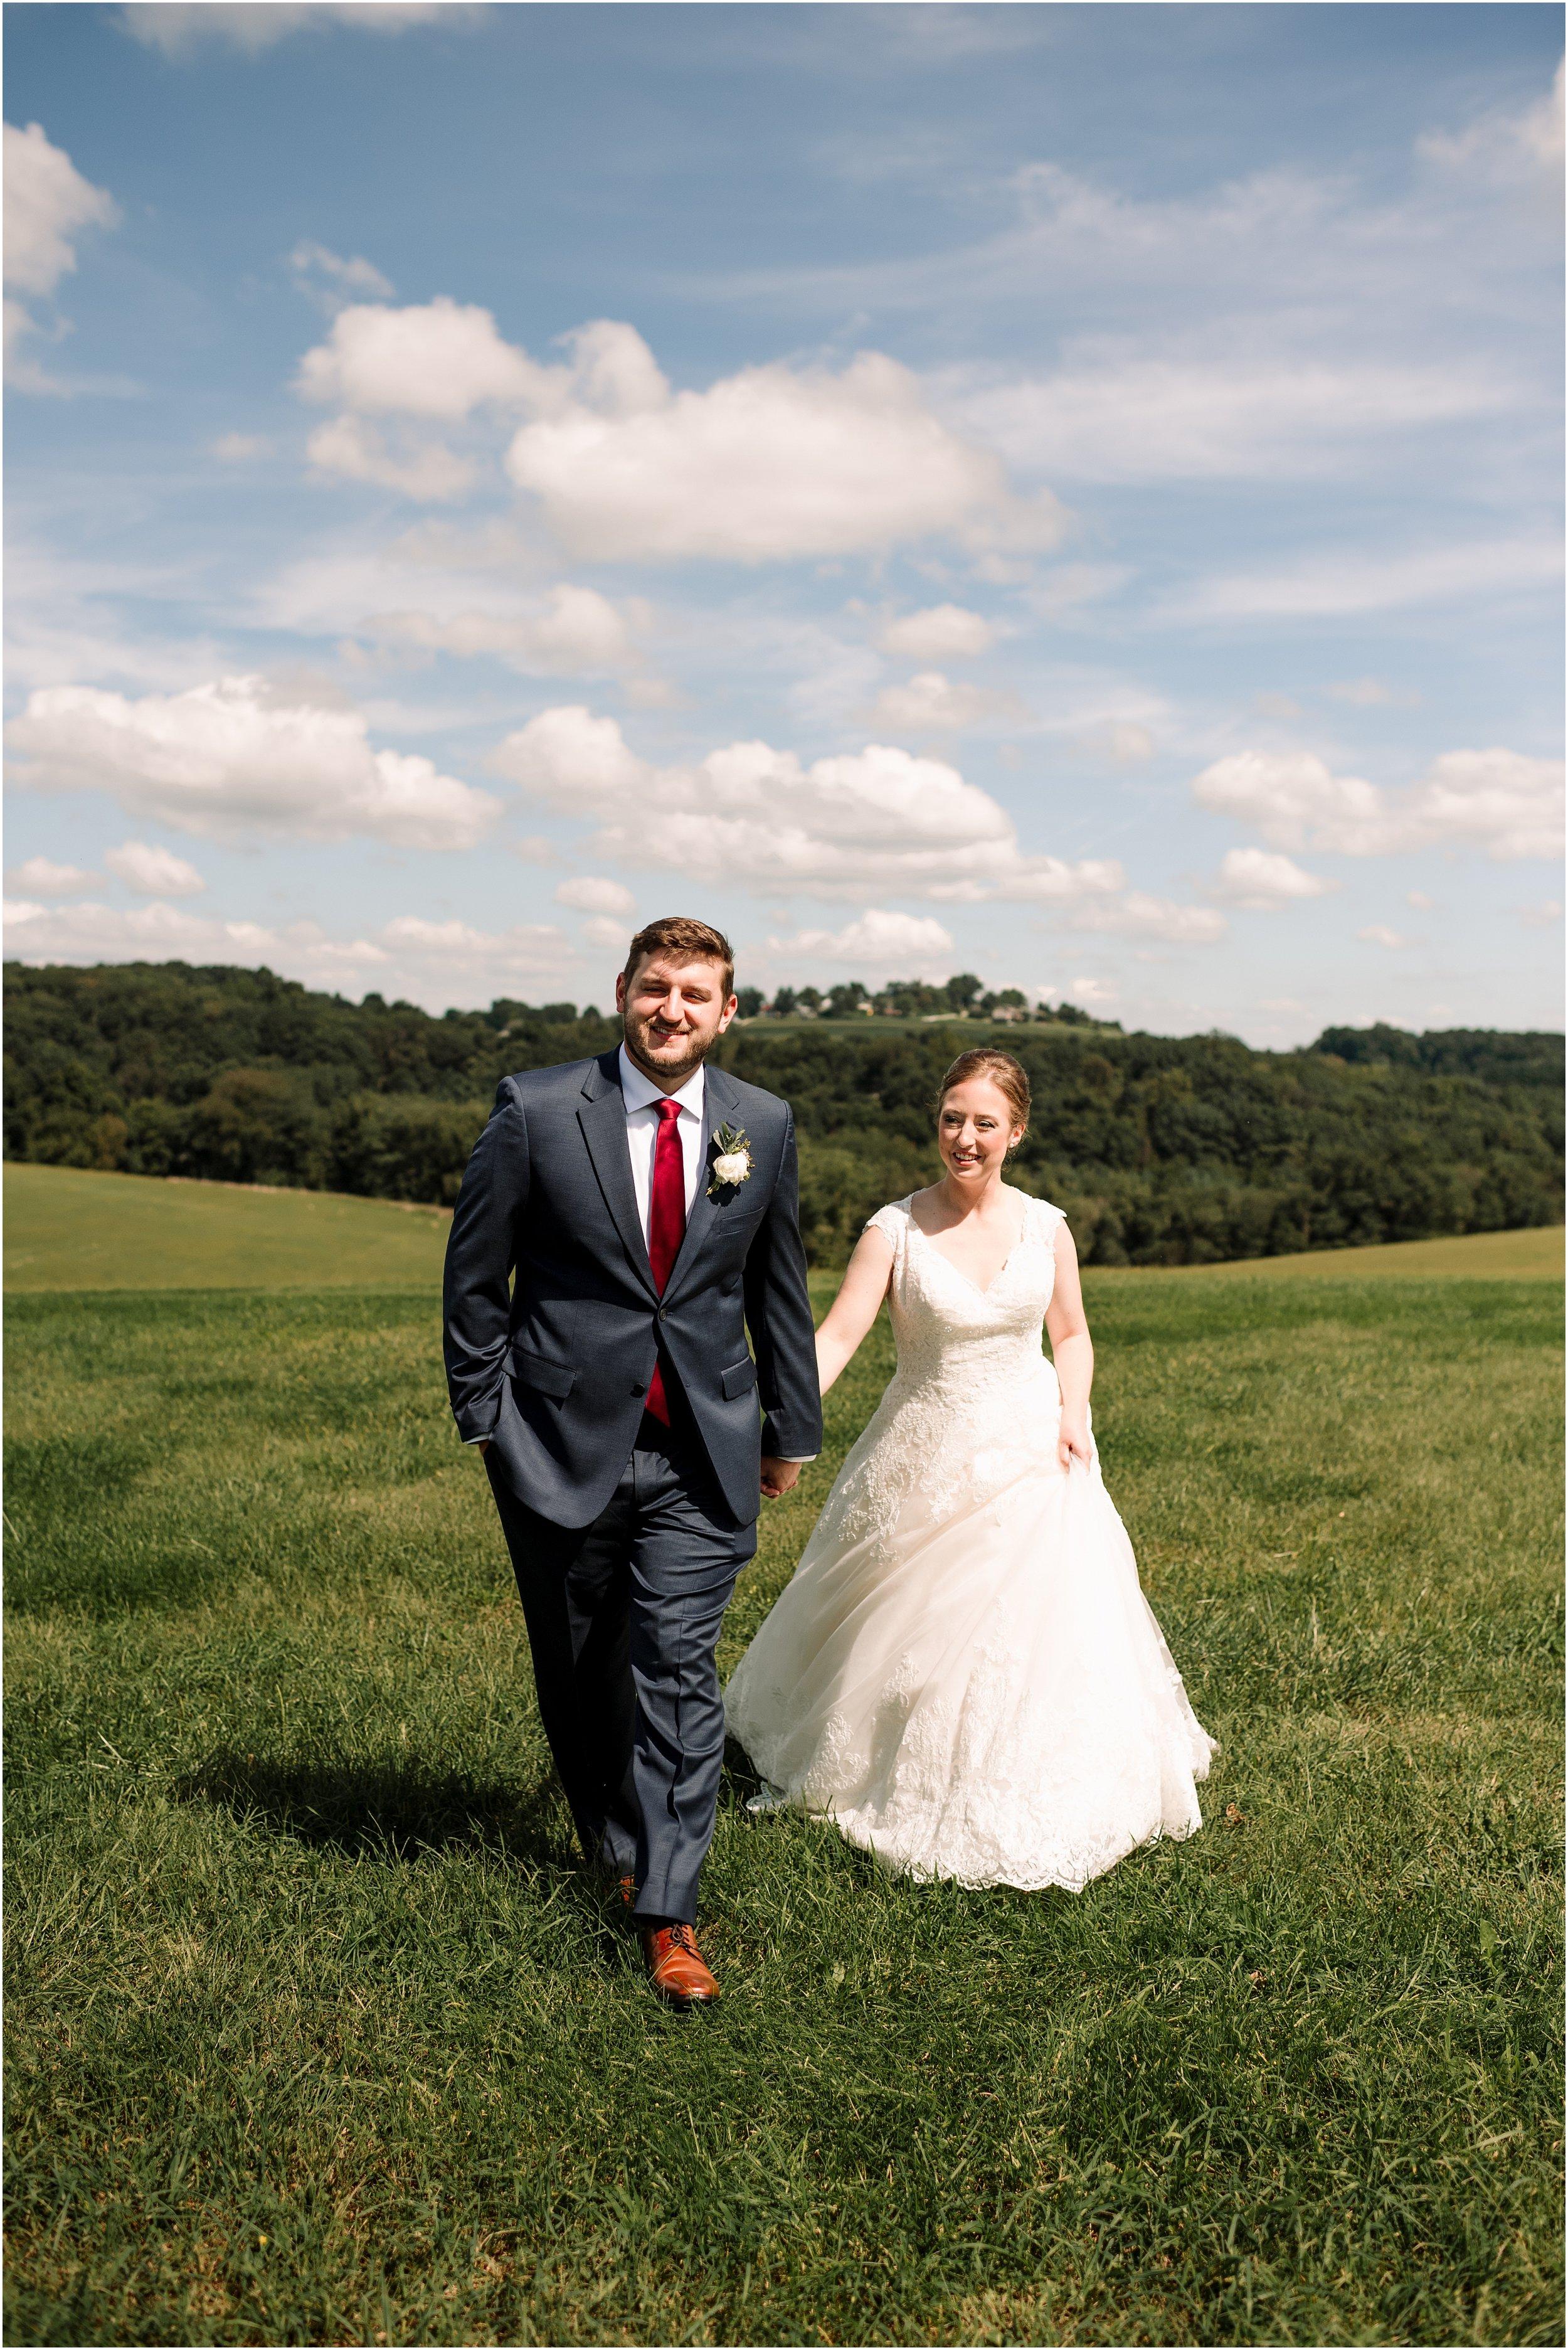 hannah leigh photography Wyndridge Farm Wedding York PA_1500.jpg